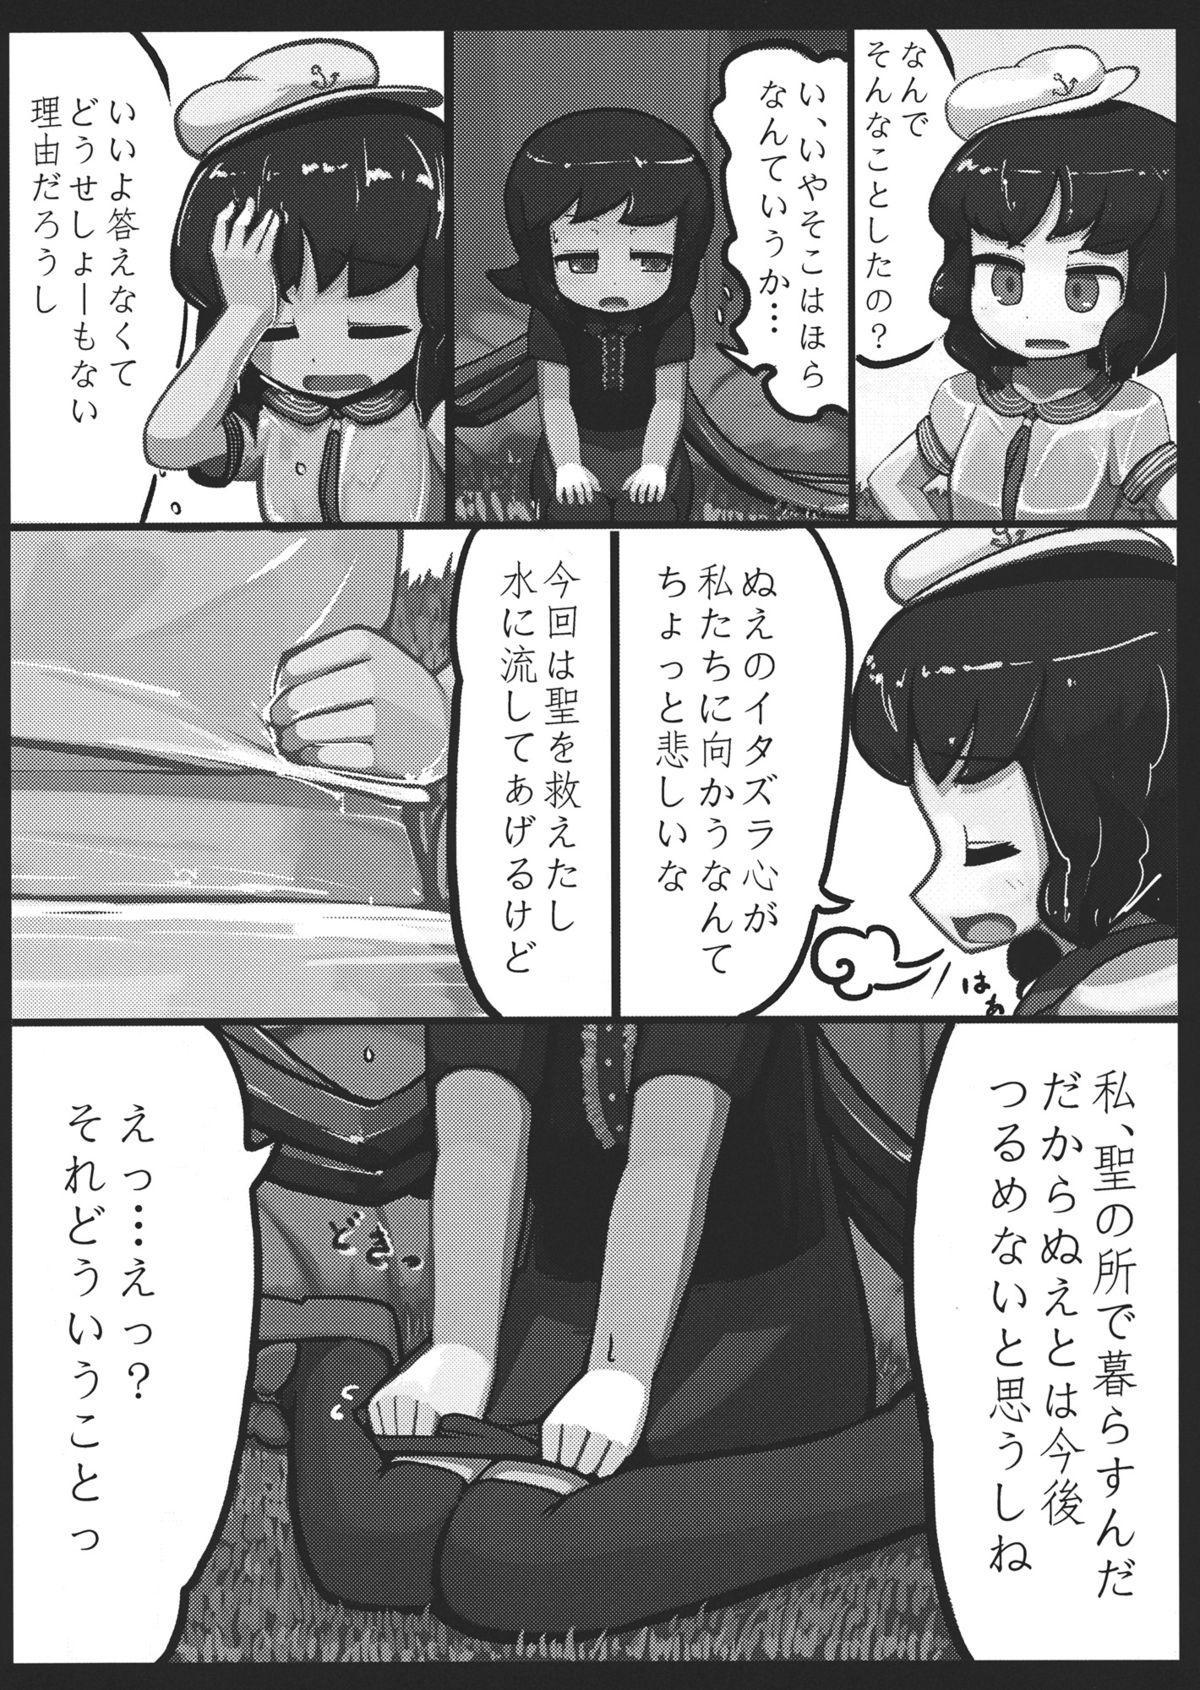 Nue x Murasa Shunga 6